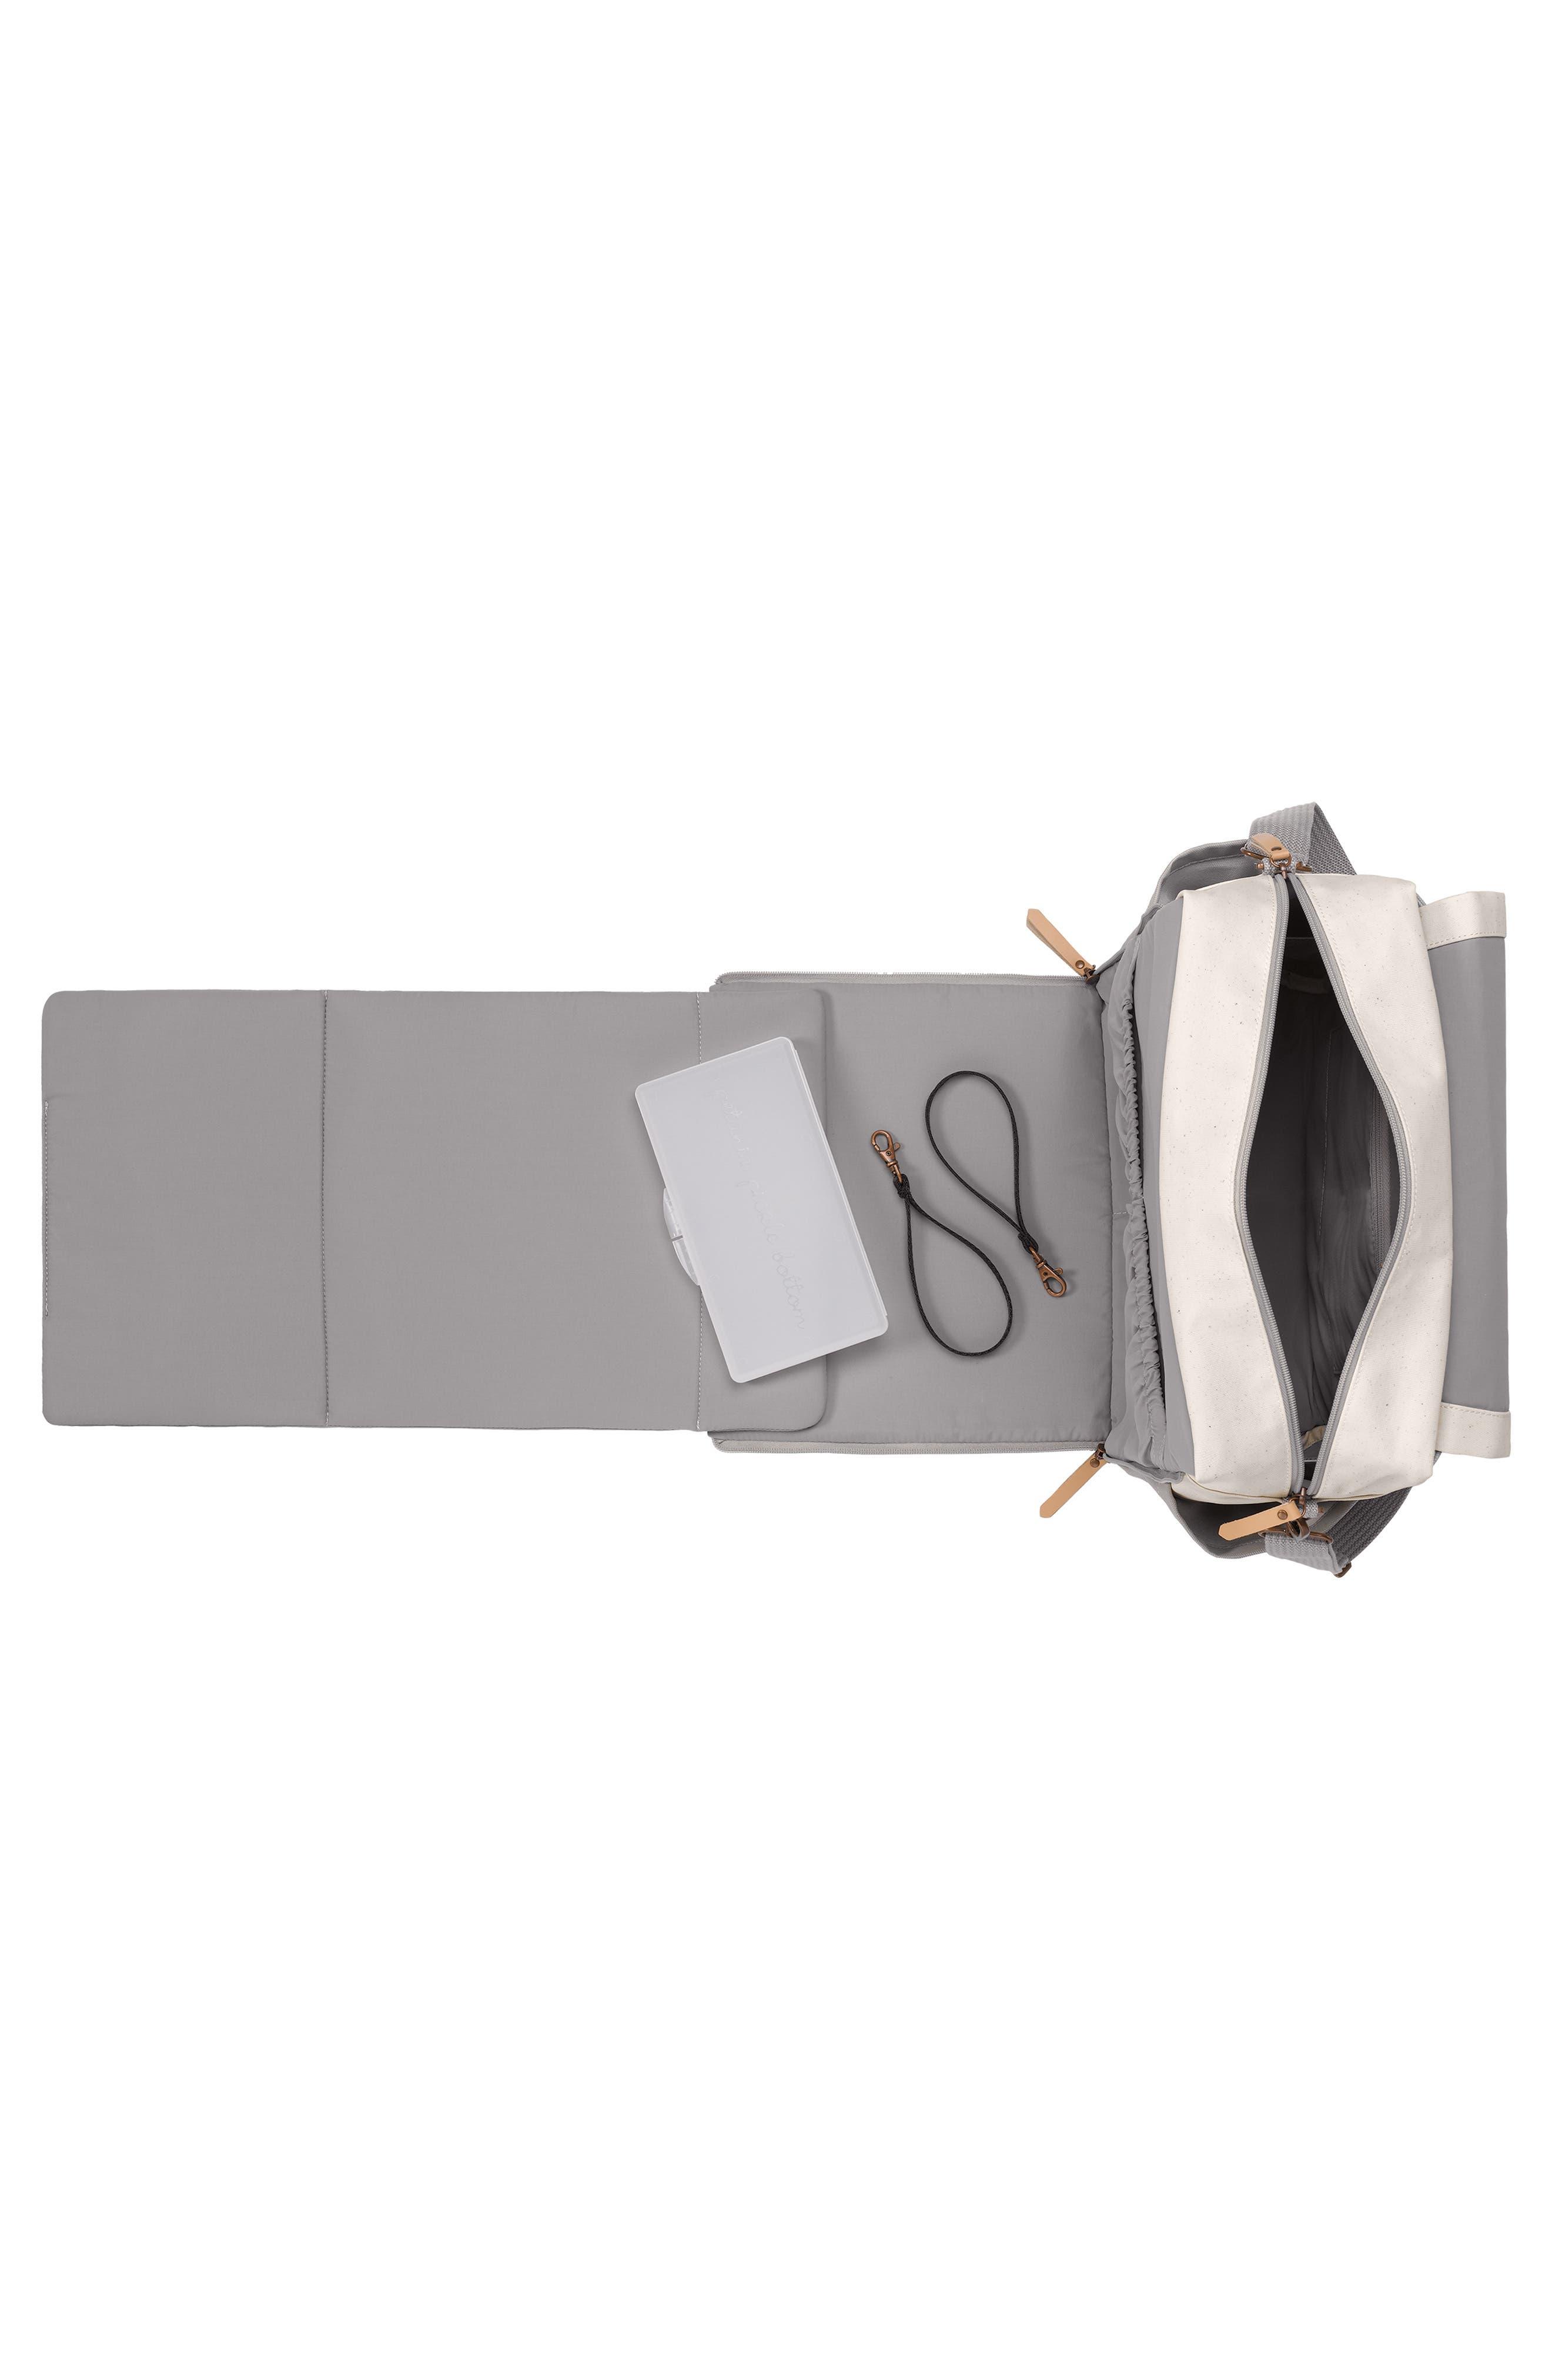 Boxy Backpack Diaper Bag,                             Alternate thumbnail 3, color,                             BIRCH/ STONE